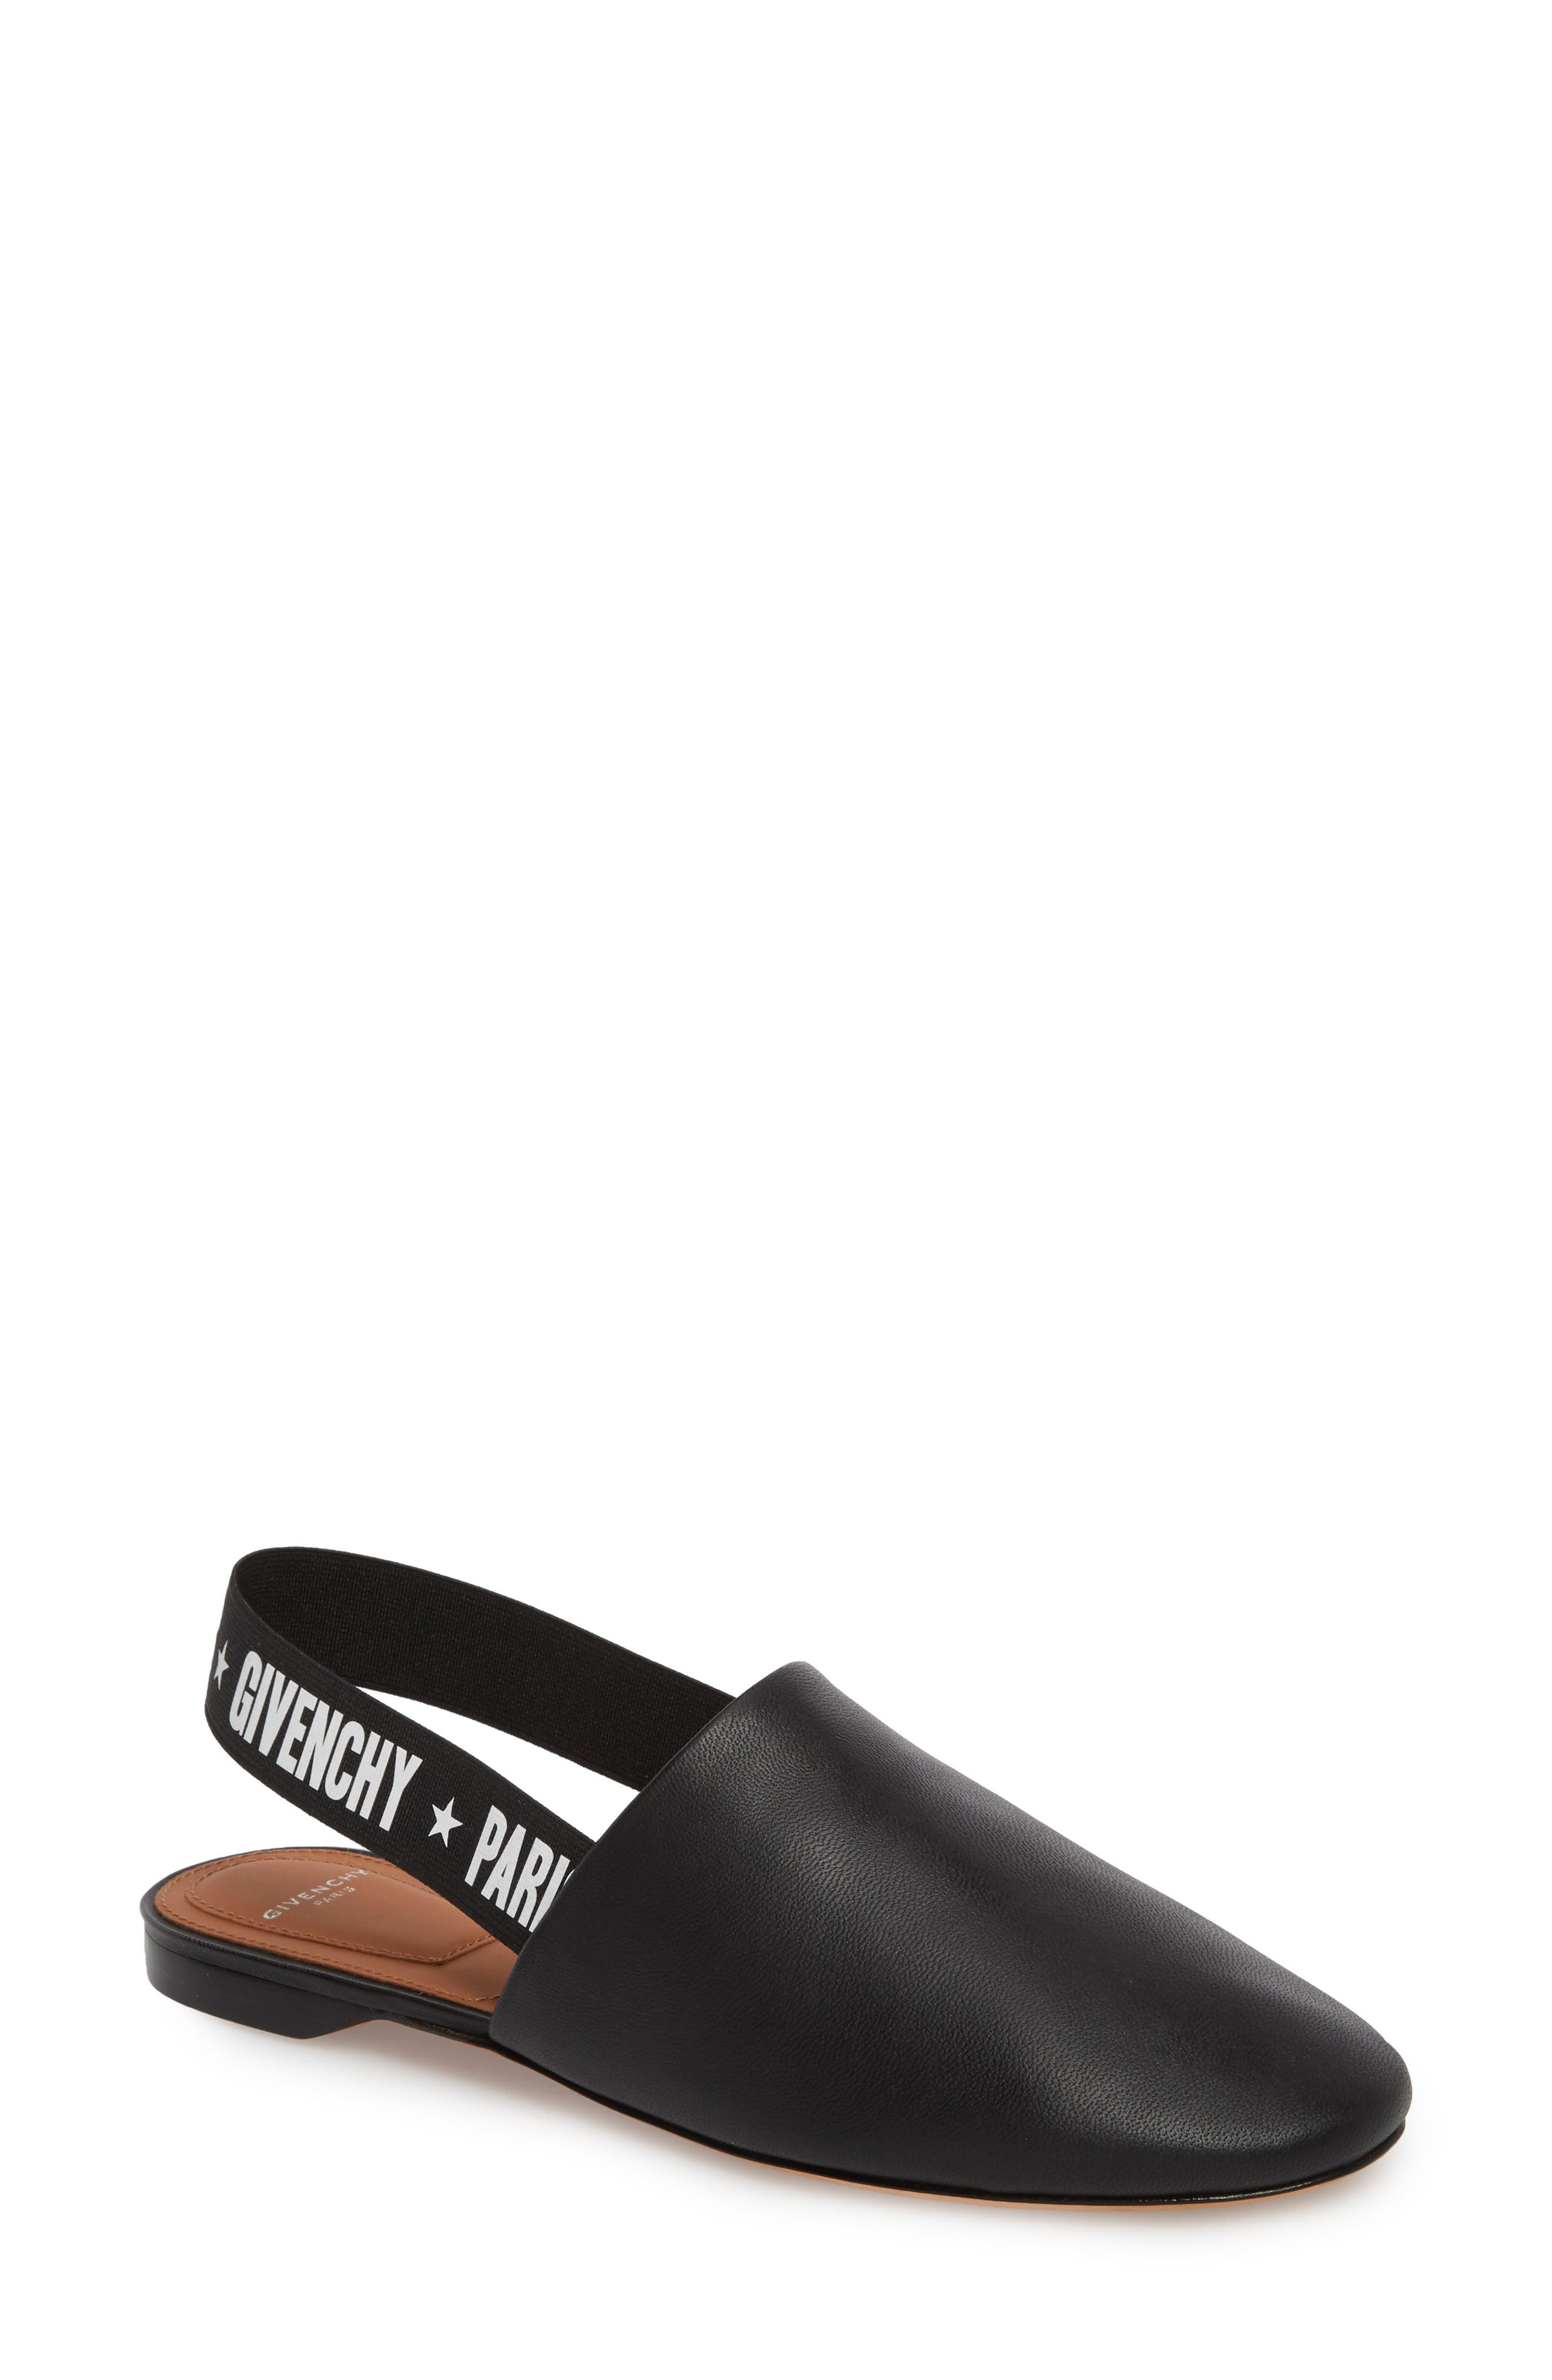 Givenchy Rivington Logo Slingback Mule - Black